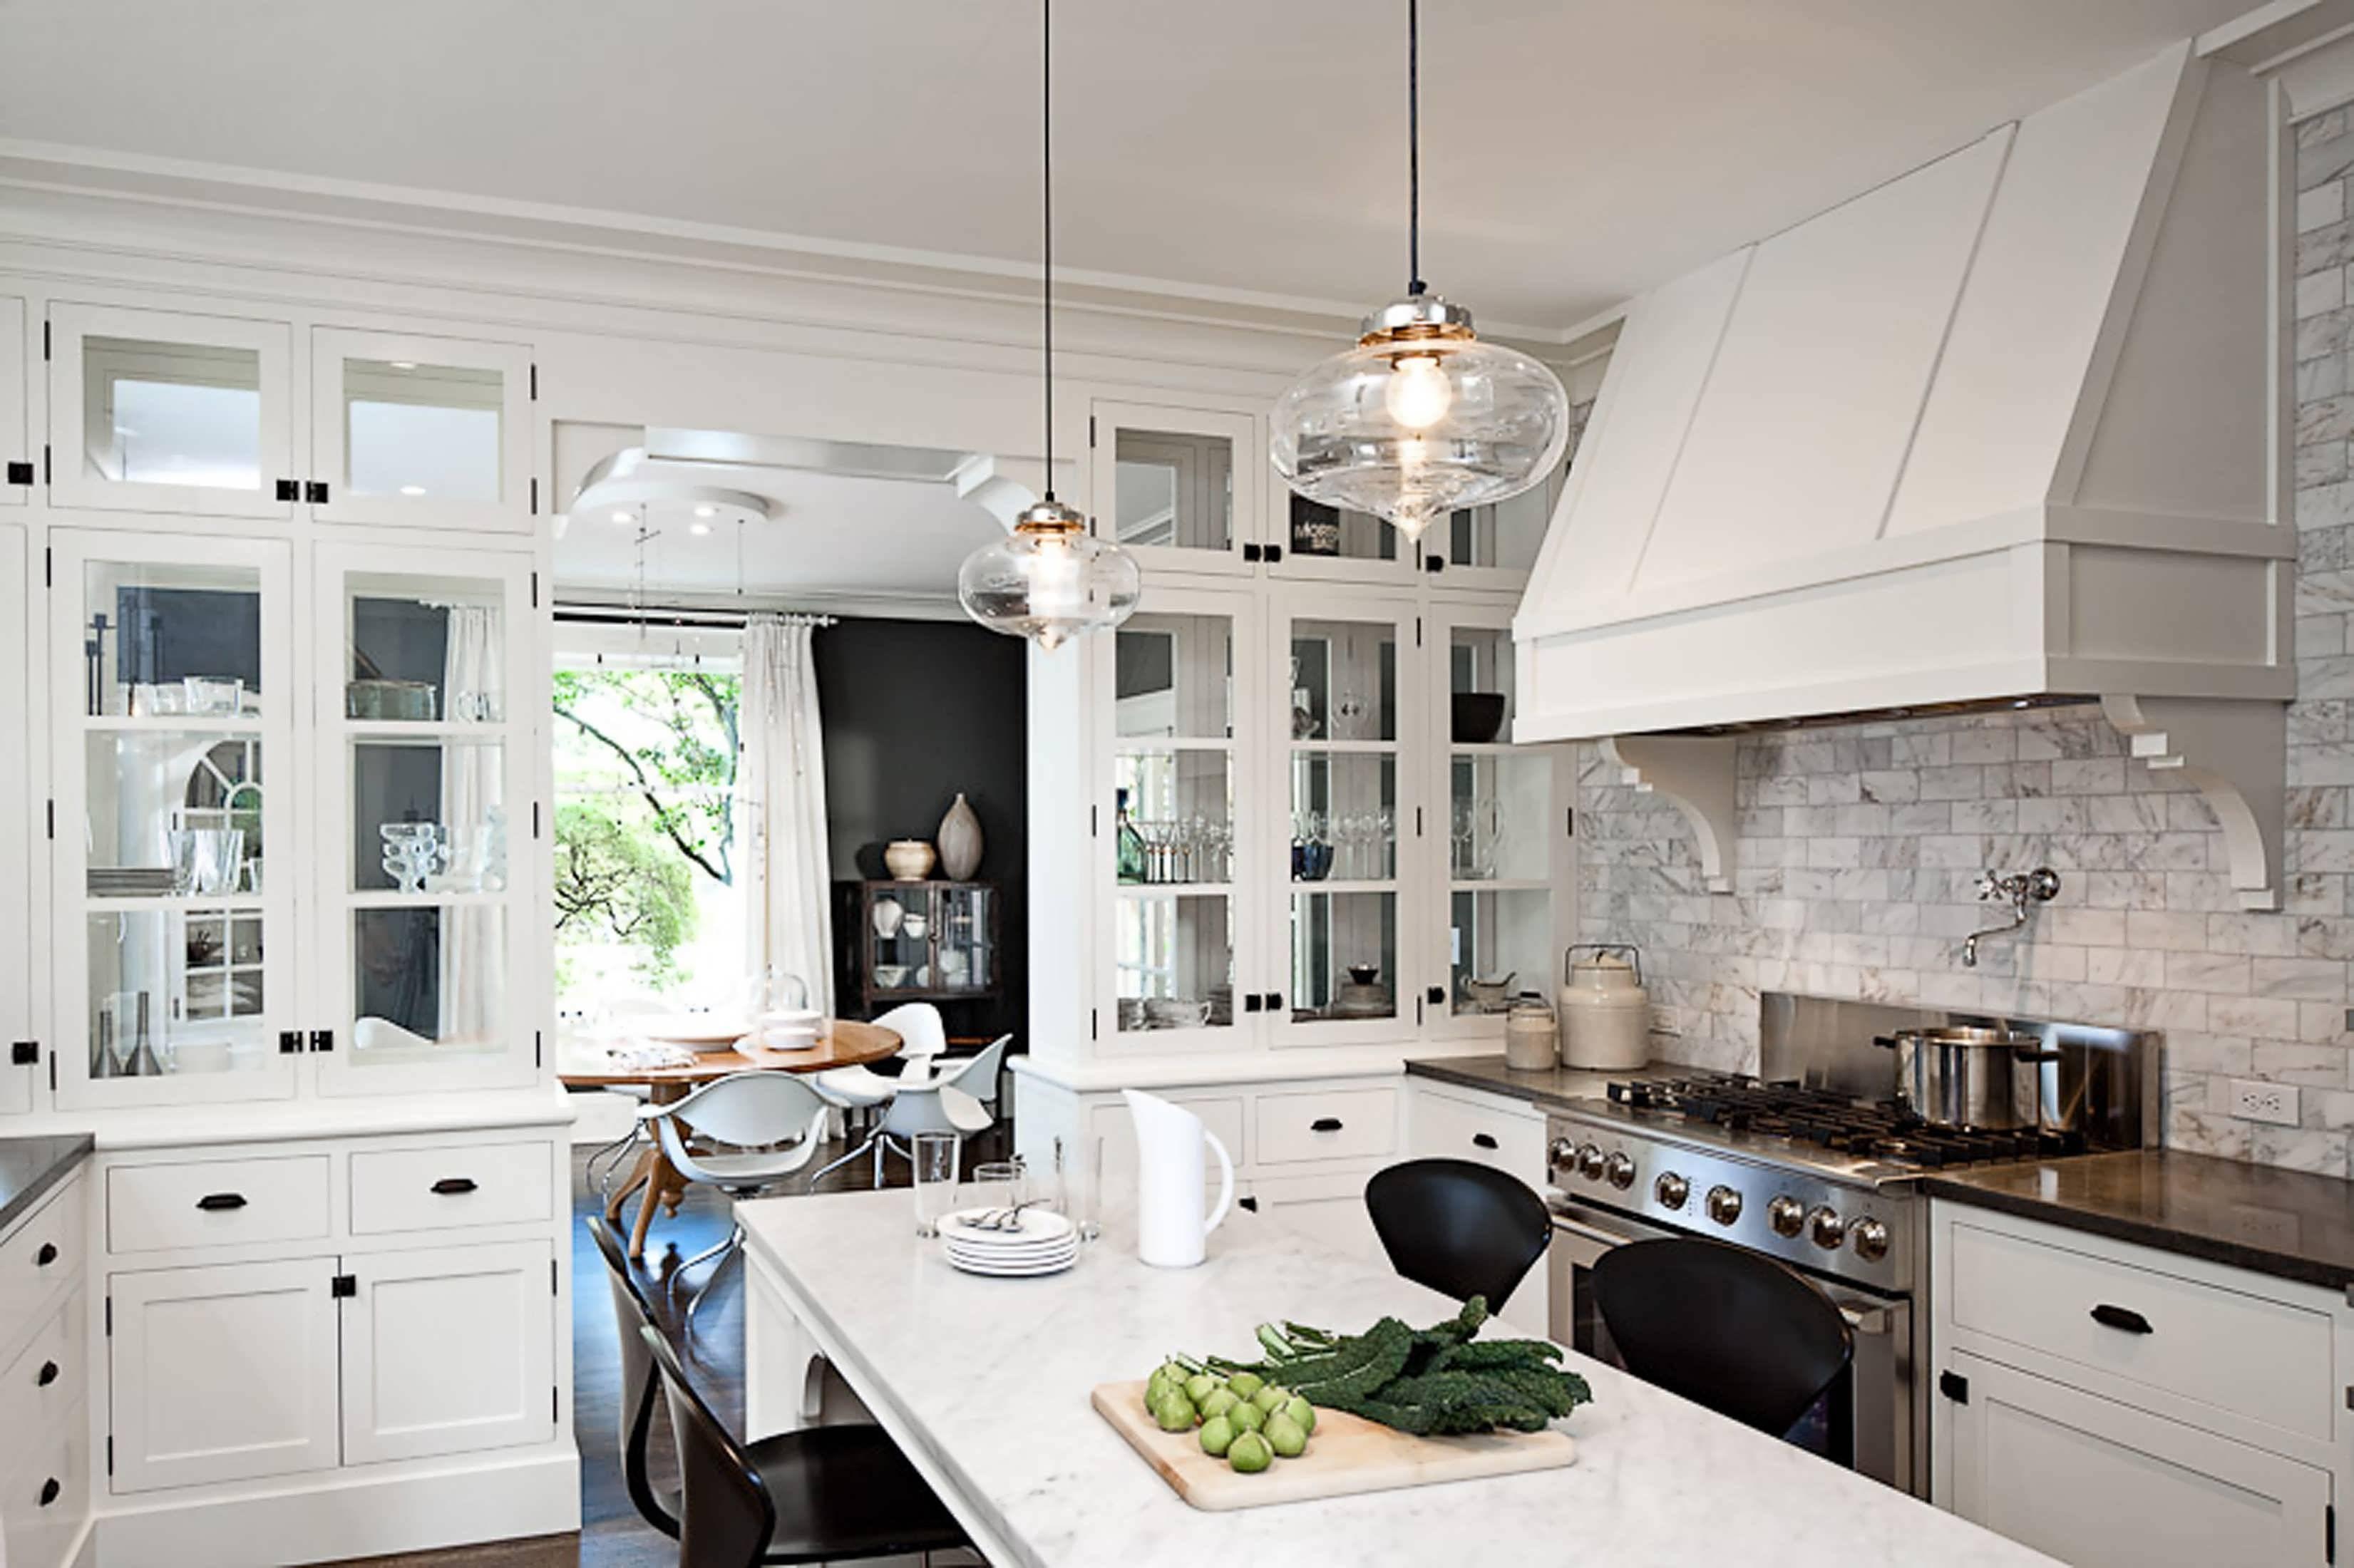 Kitchen : Long Pendant Light Kitchen Pendant Lighting Kitchen intended for Double Pendant Lights for Kitchen (Image 7 of 15)